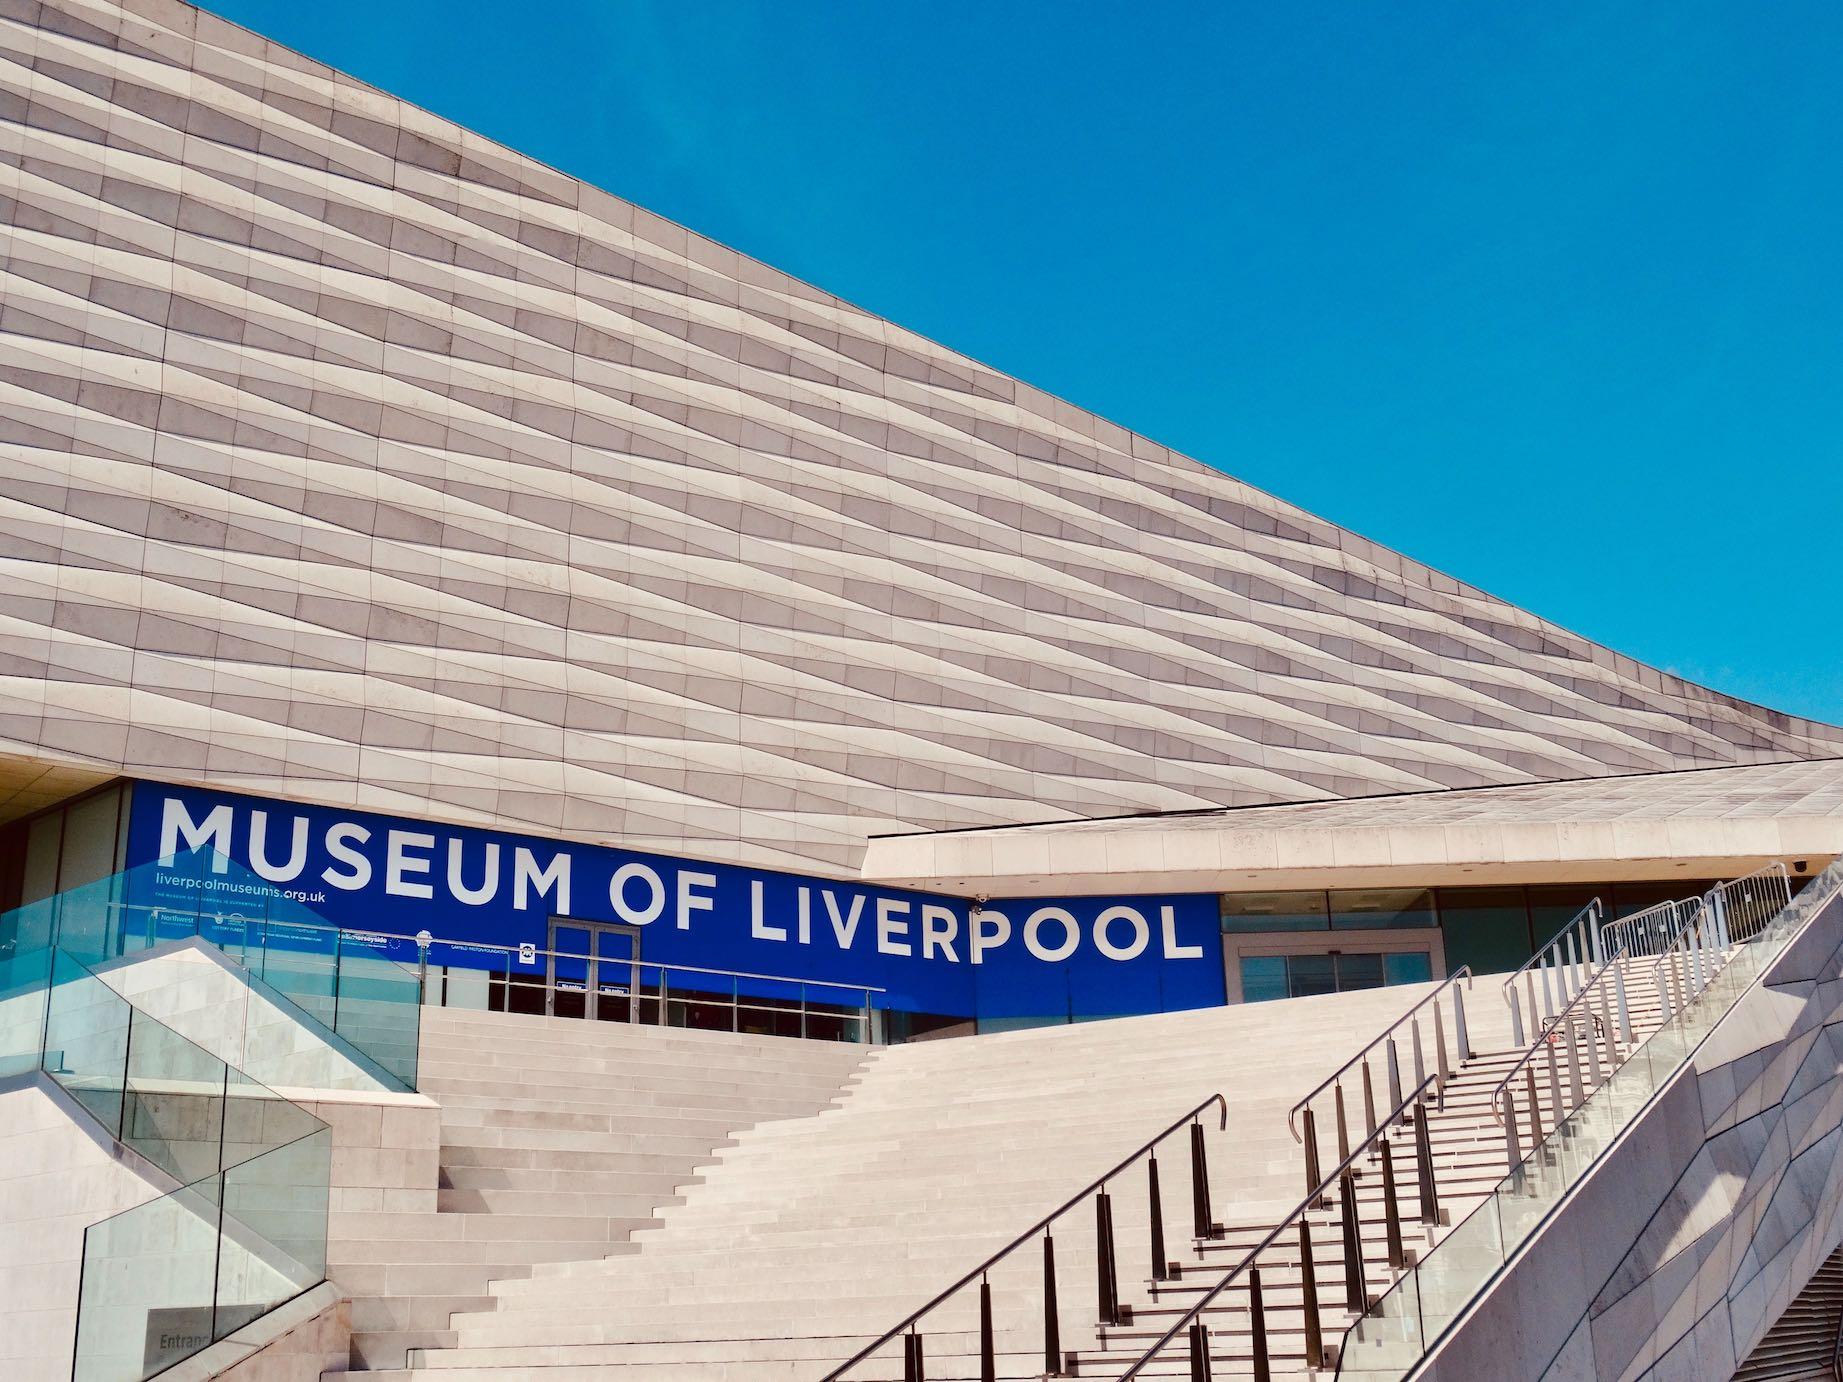 Exterior Museum of Liverpool.